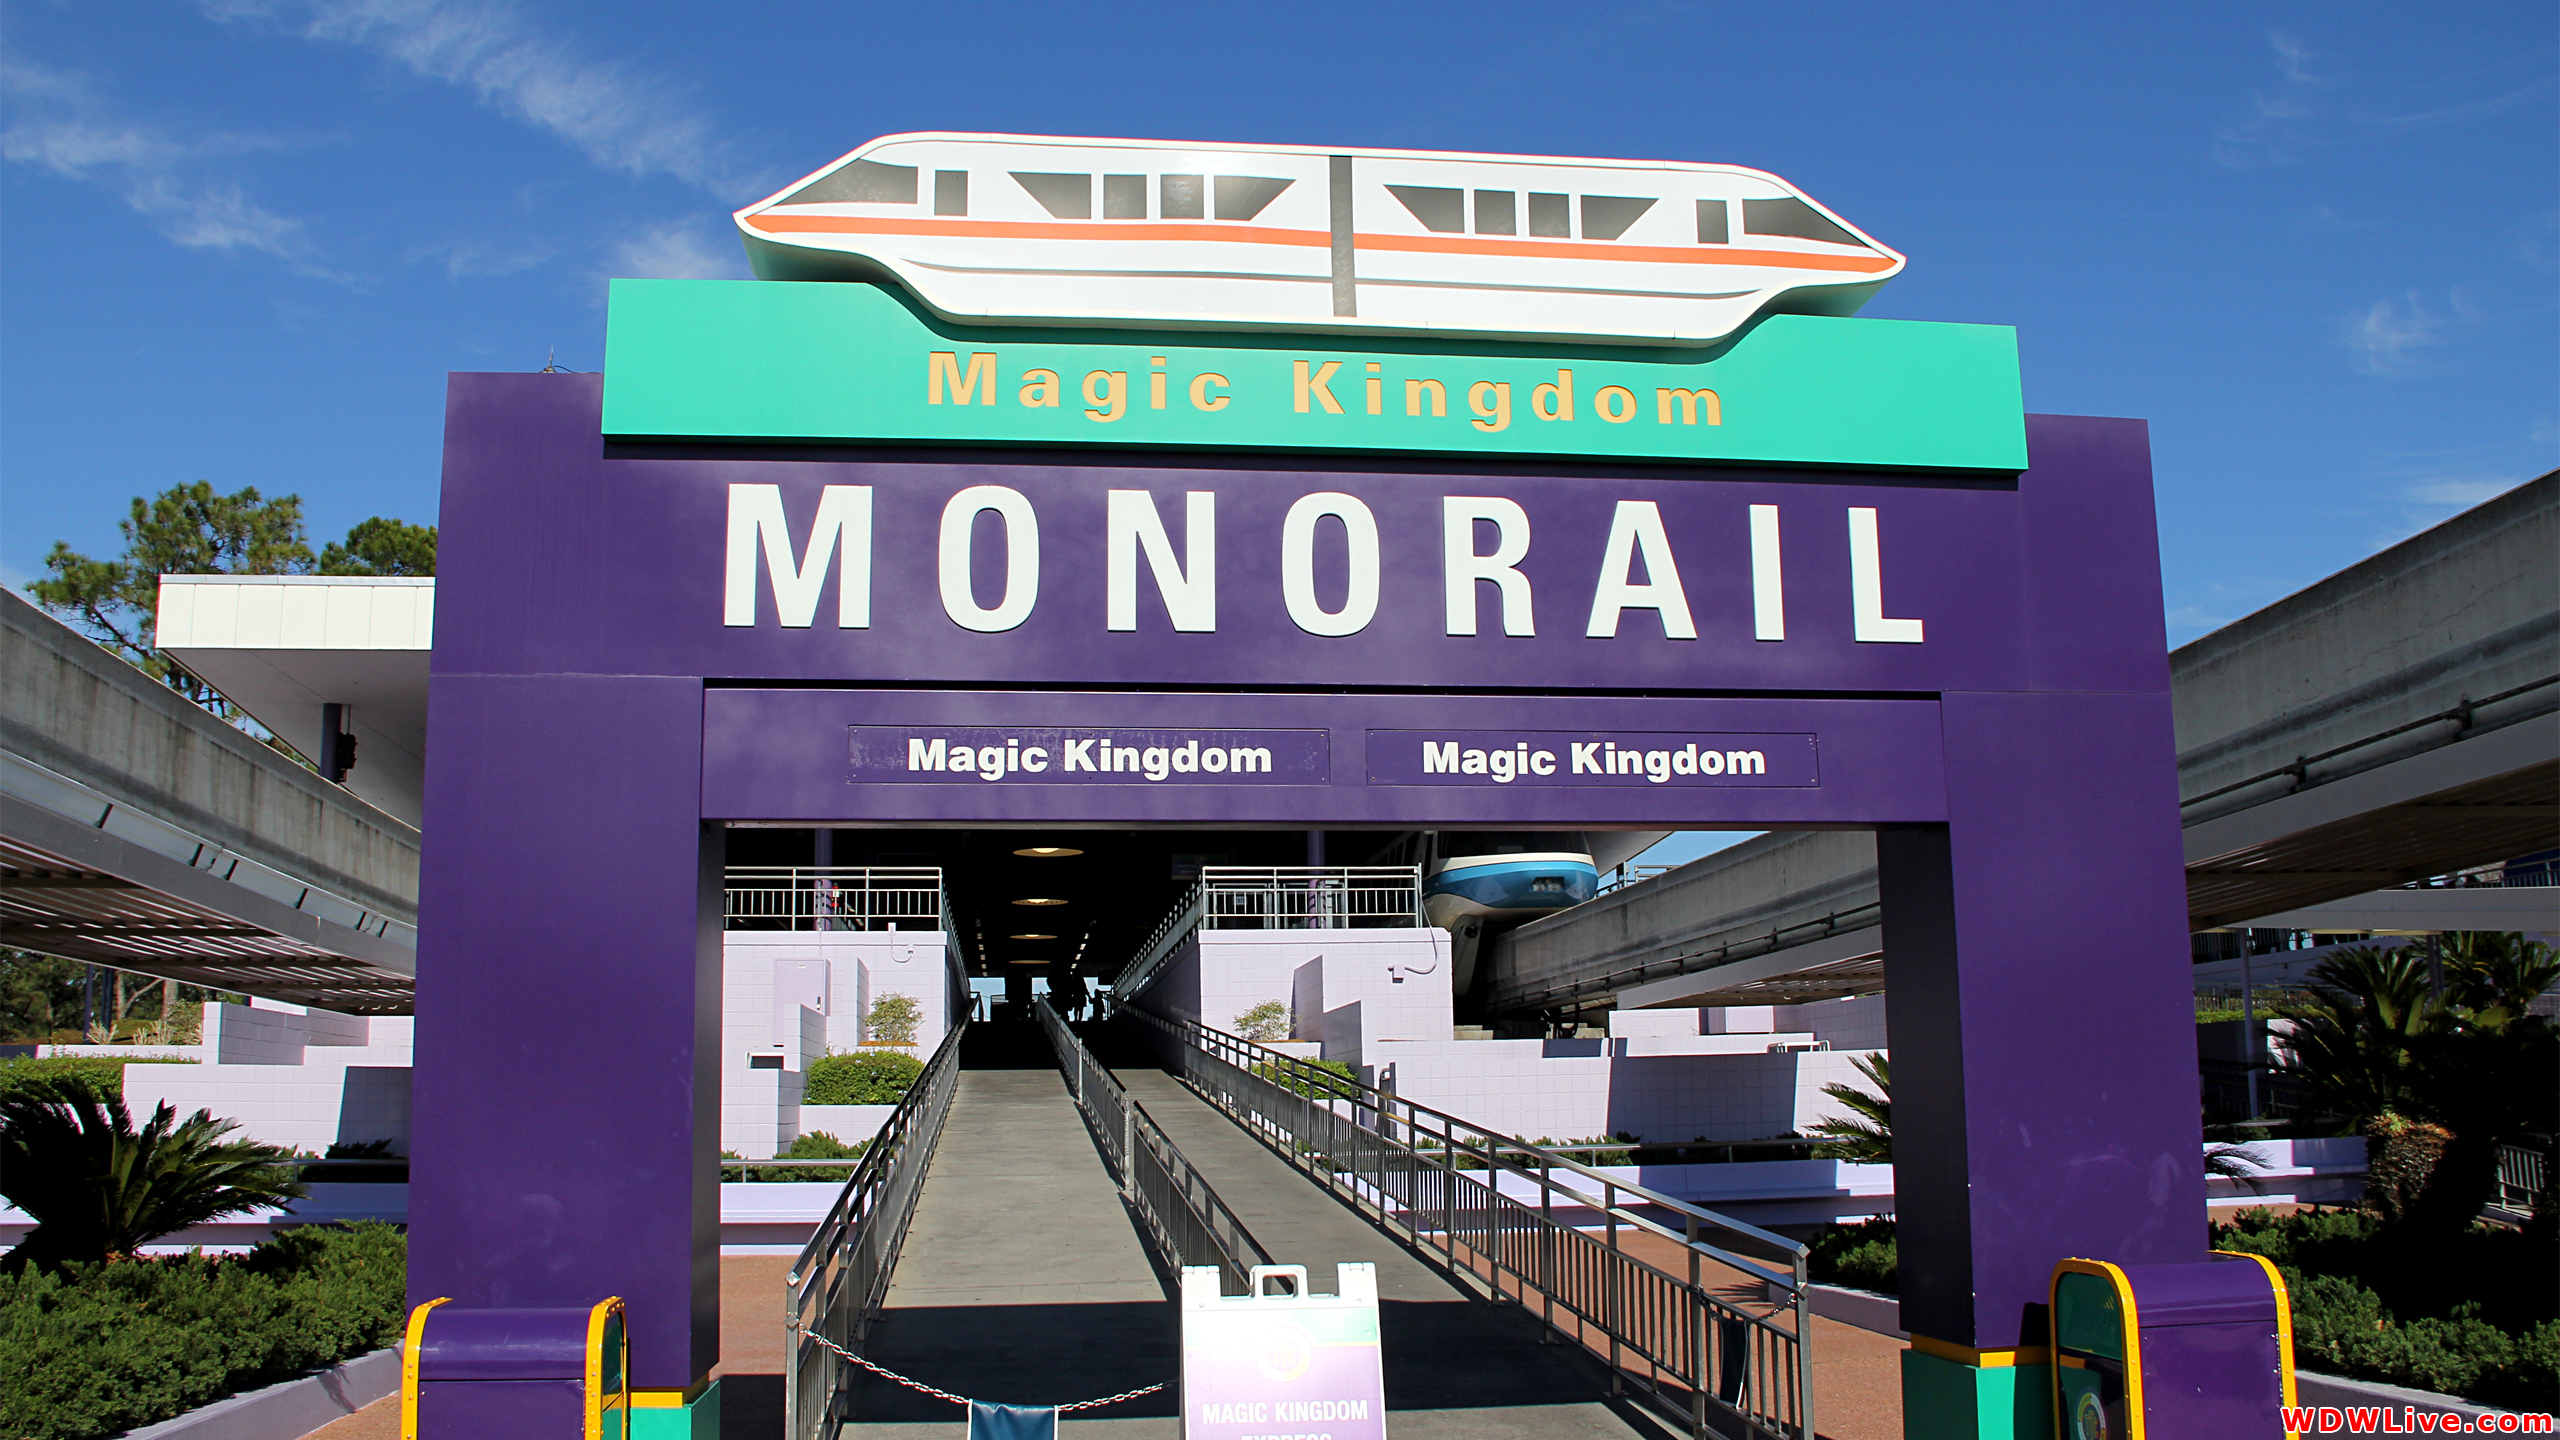 [Walt Disney World Resort] Transportation System - Services de transport - Page 4 Ttc-magic-kingdom-monorail-4-9